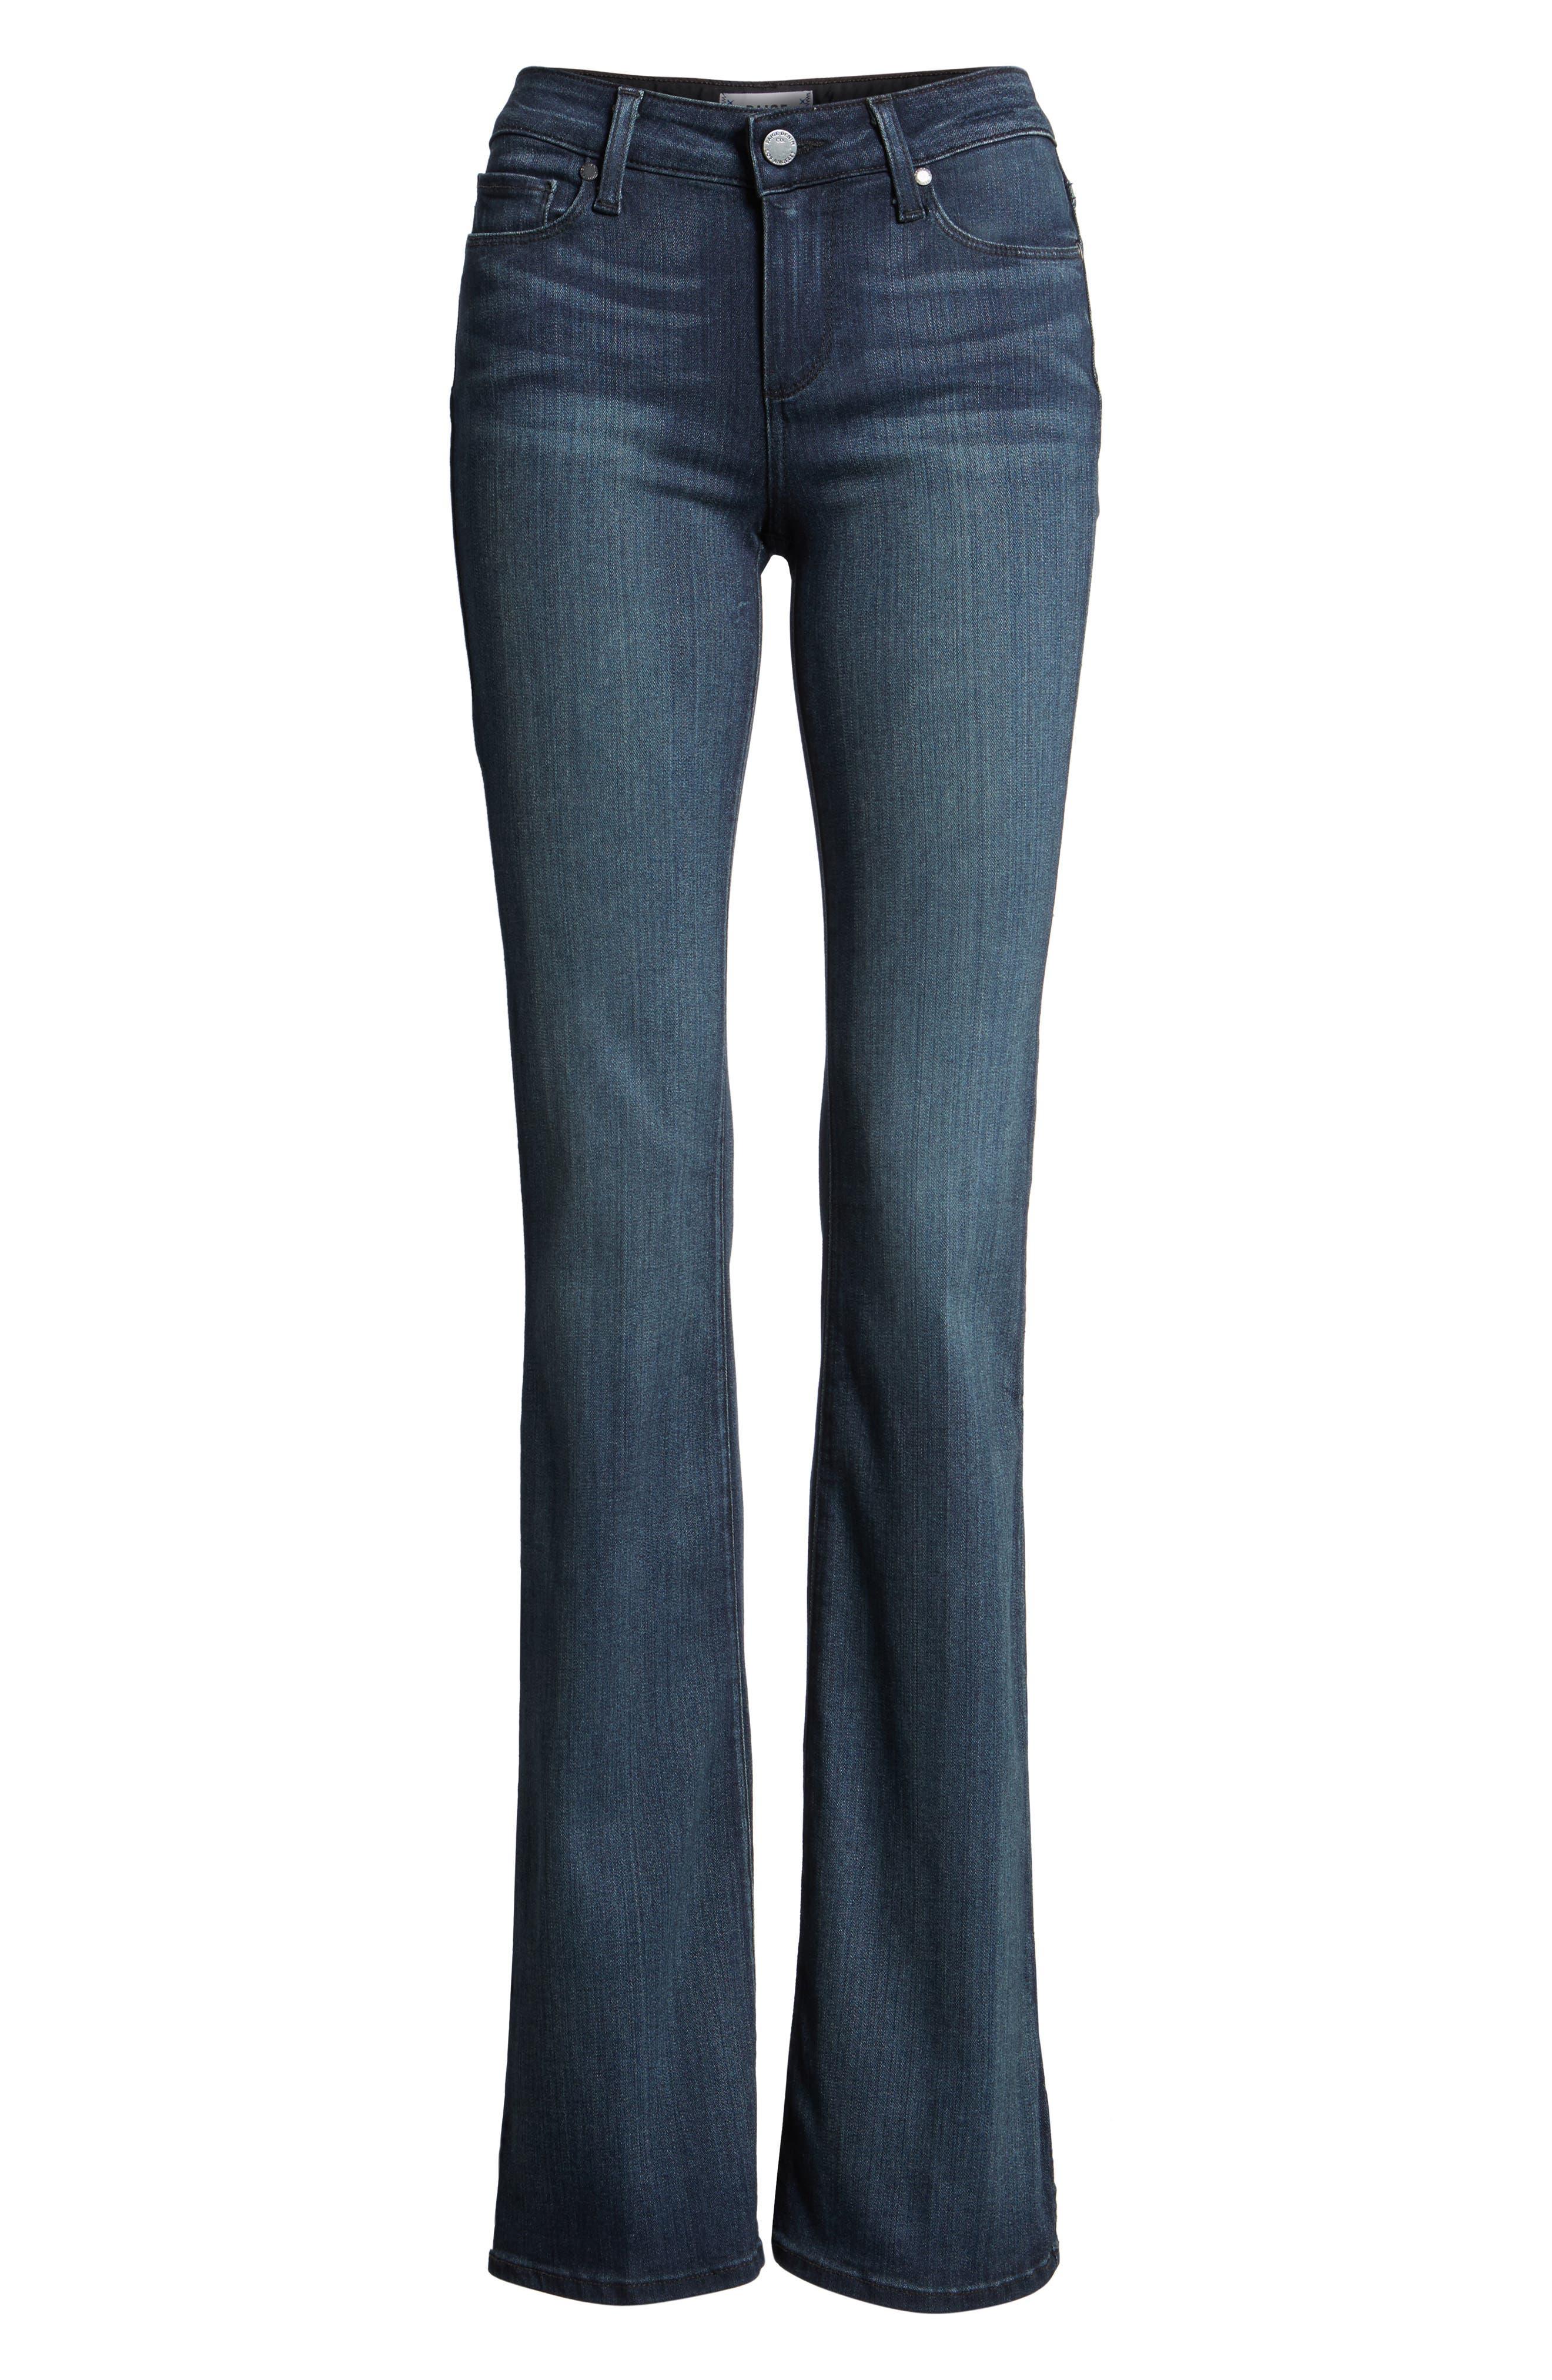 Transcend - Skyline Bootcut Jeans,                             Alternate thumbnail 2, color,                             VALOR